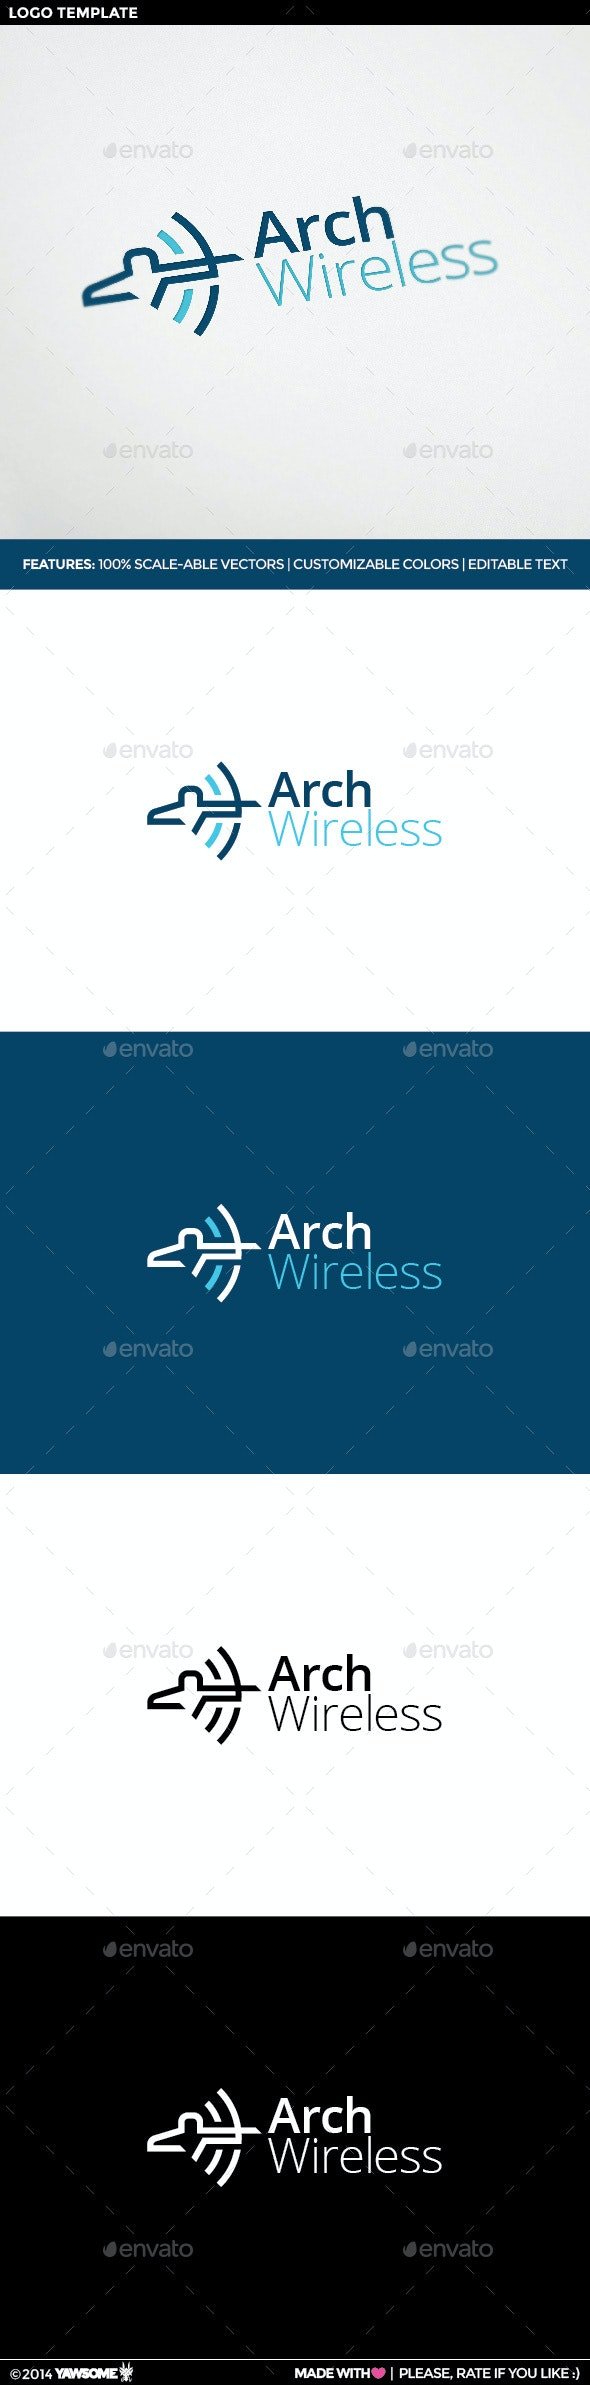 Arch Wireless Logo - Logo Templates